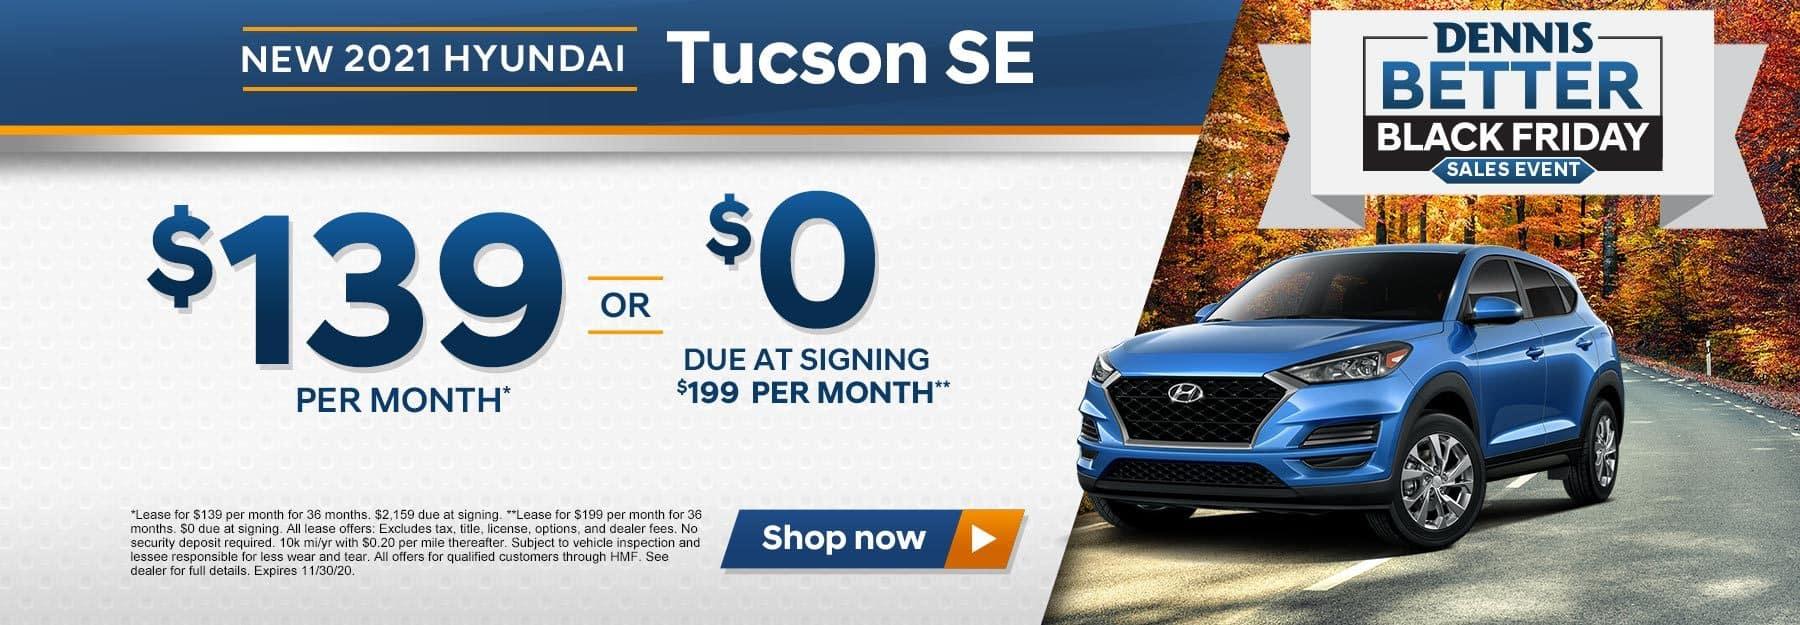 DennisHyundai_Slide_1800x625_11-20_Tucson_z